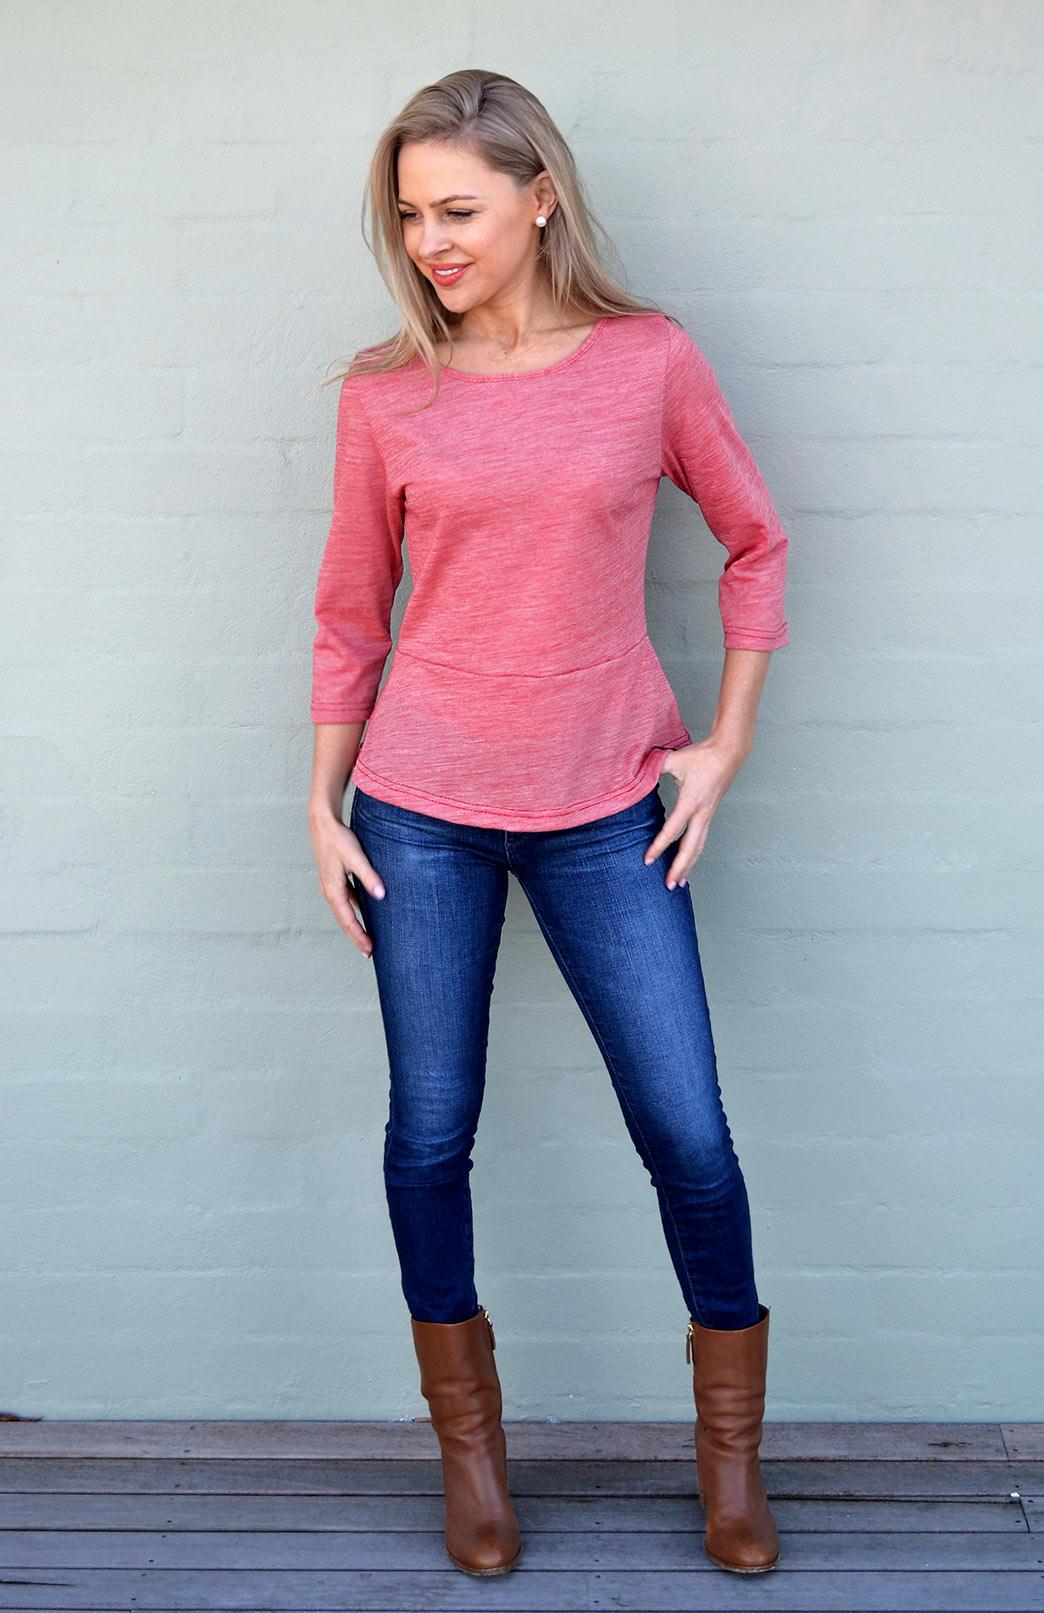 Peplum Top - 3/4 Sleeve - Women's Red Pinstripe Wool Cotton Blend 3/4 Sleeve Spring Top - Smitten Merino Tasmania Australia